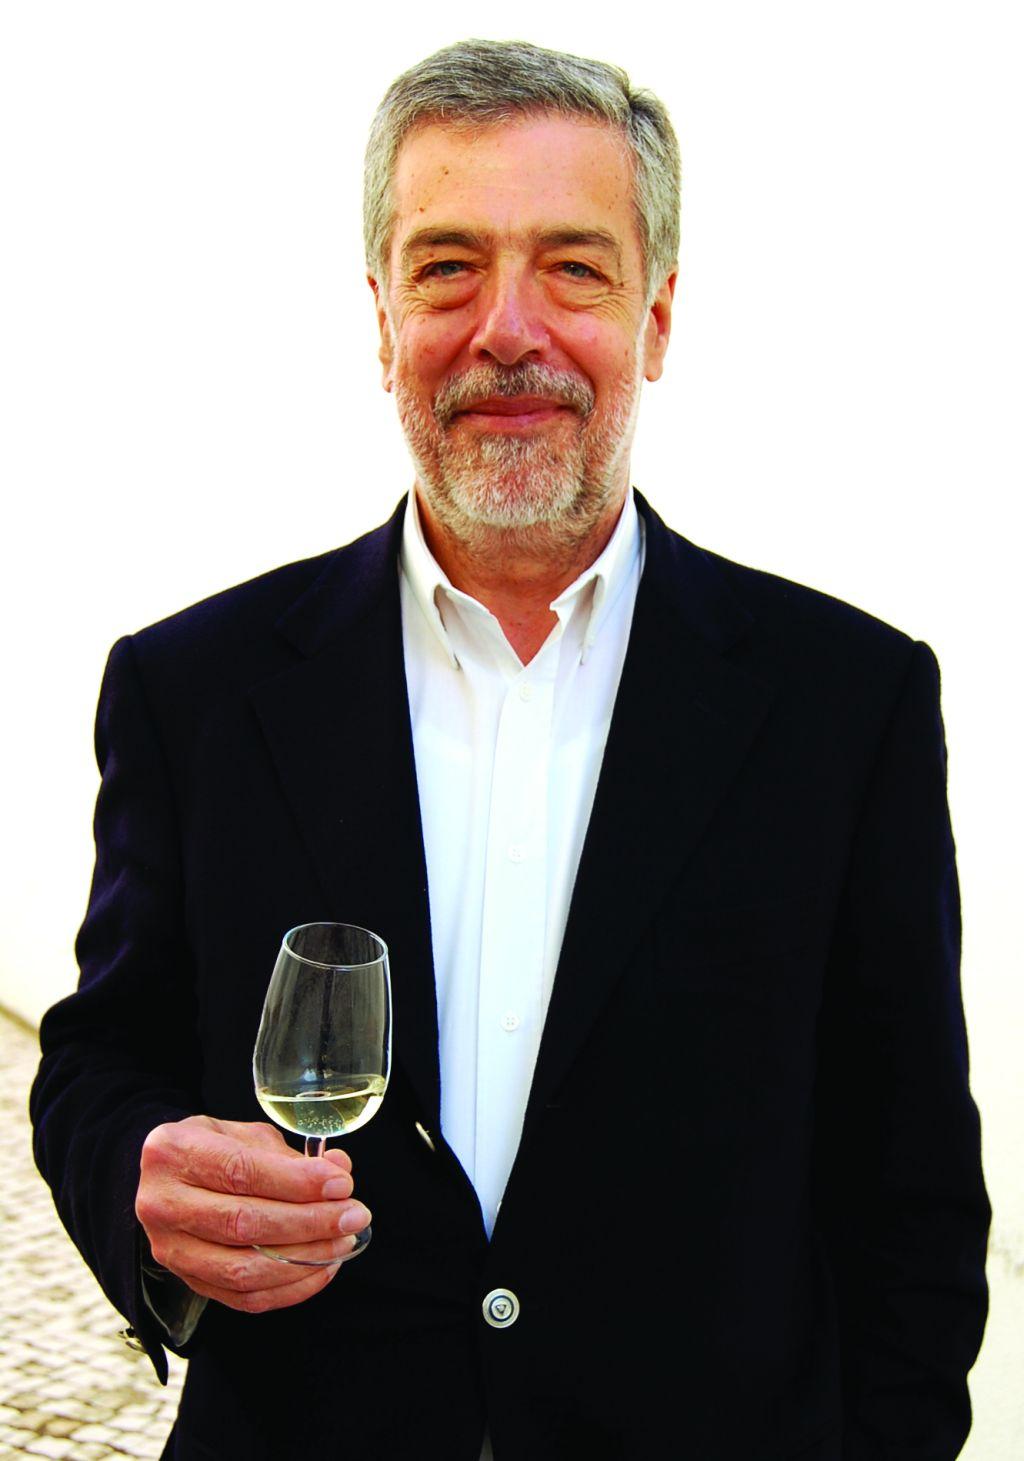 José Pinto Gaspar, presidente da CVR Tejo